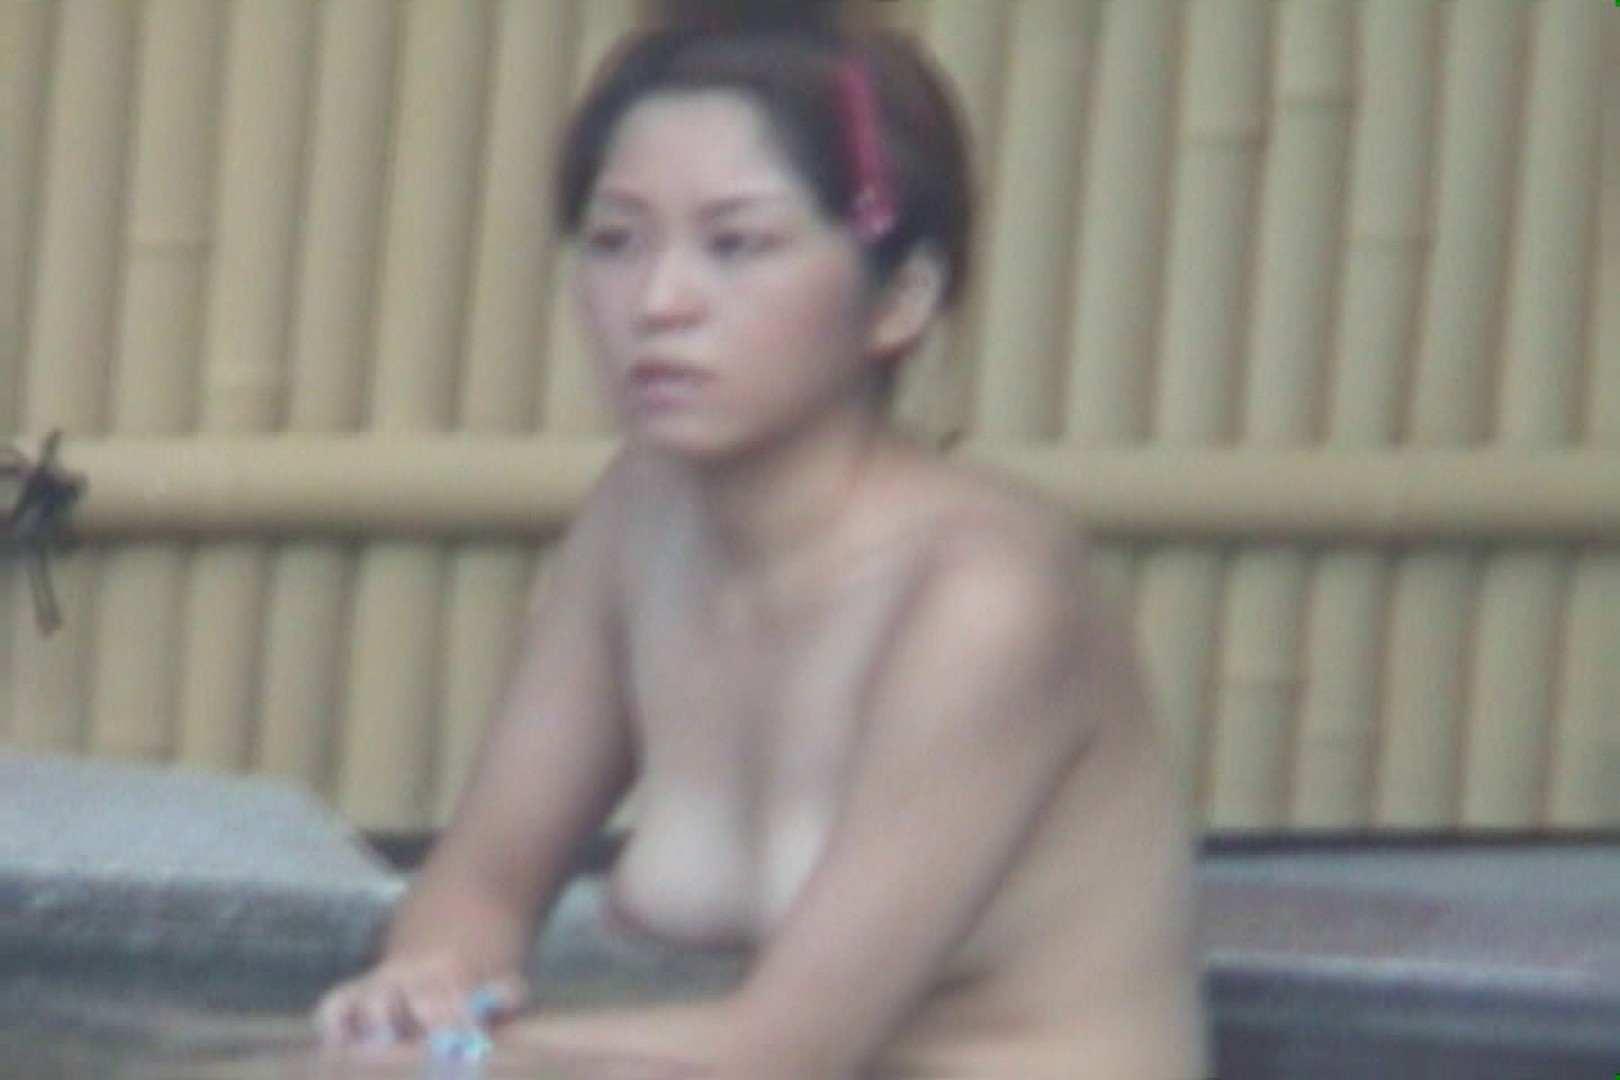 Aquaな露天風呂Vol.574 盗撮 | OLセックス  97画像 70